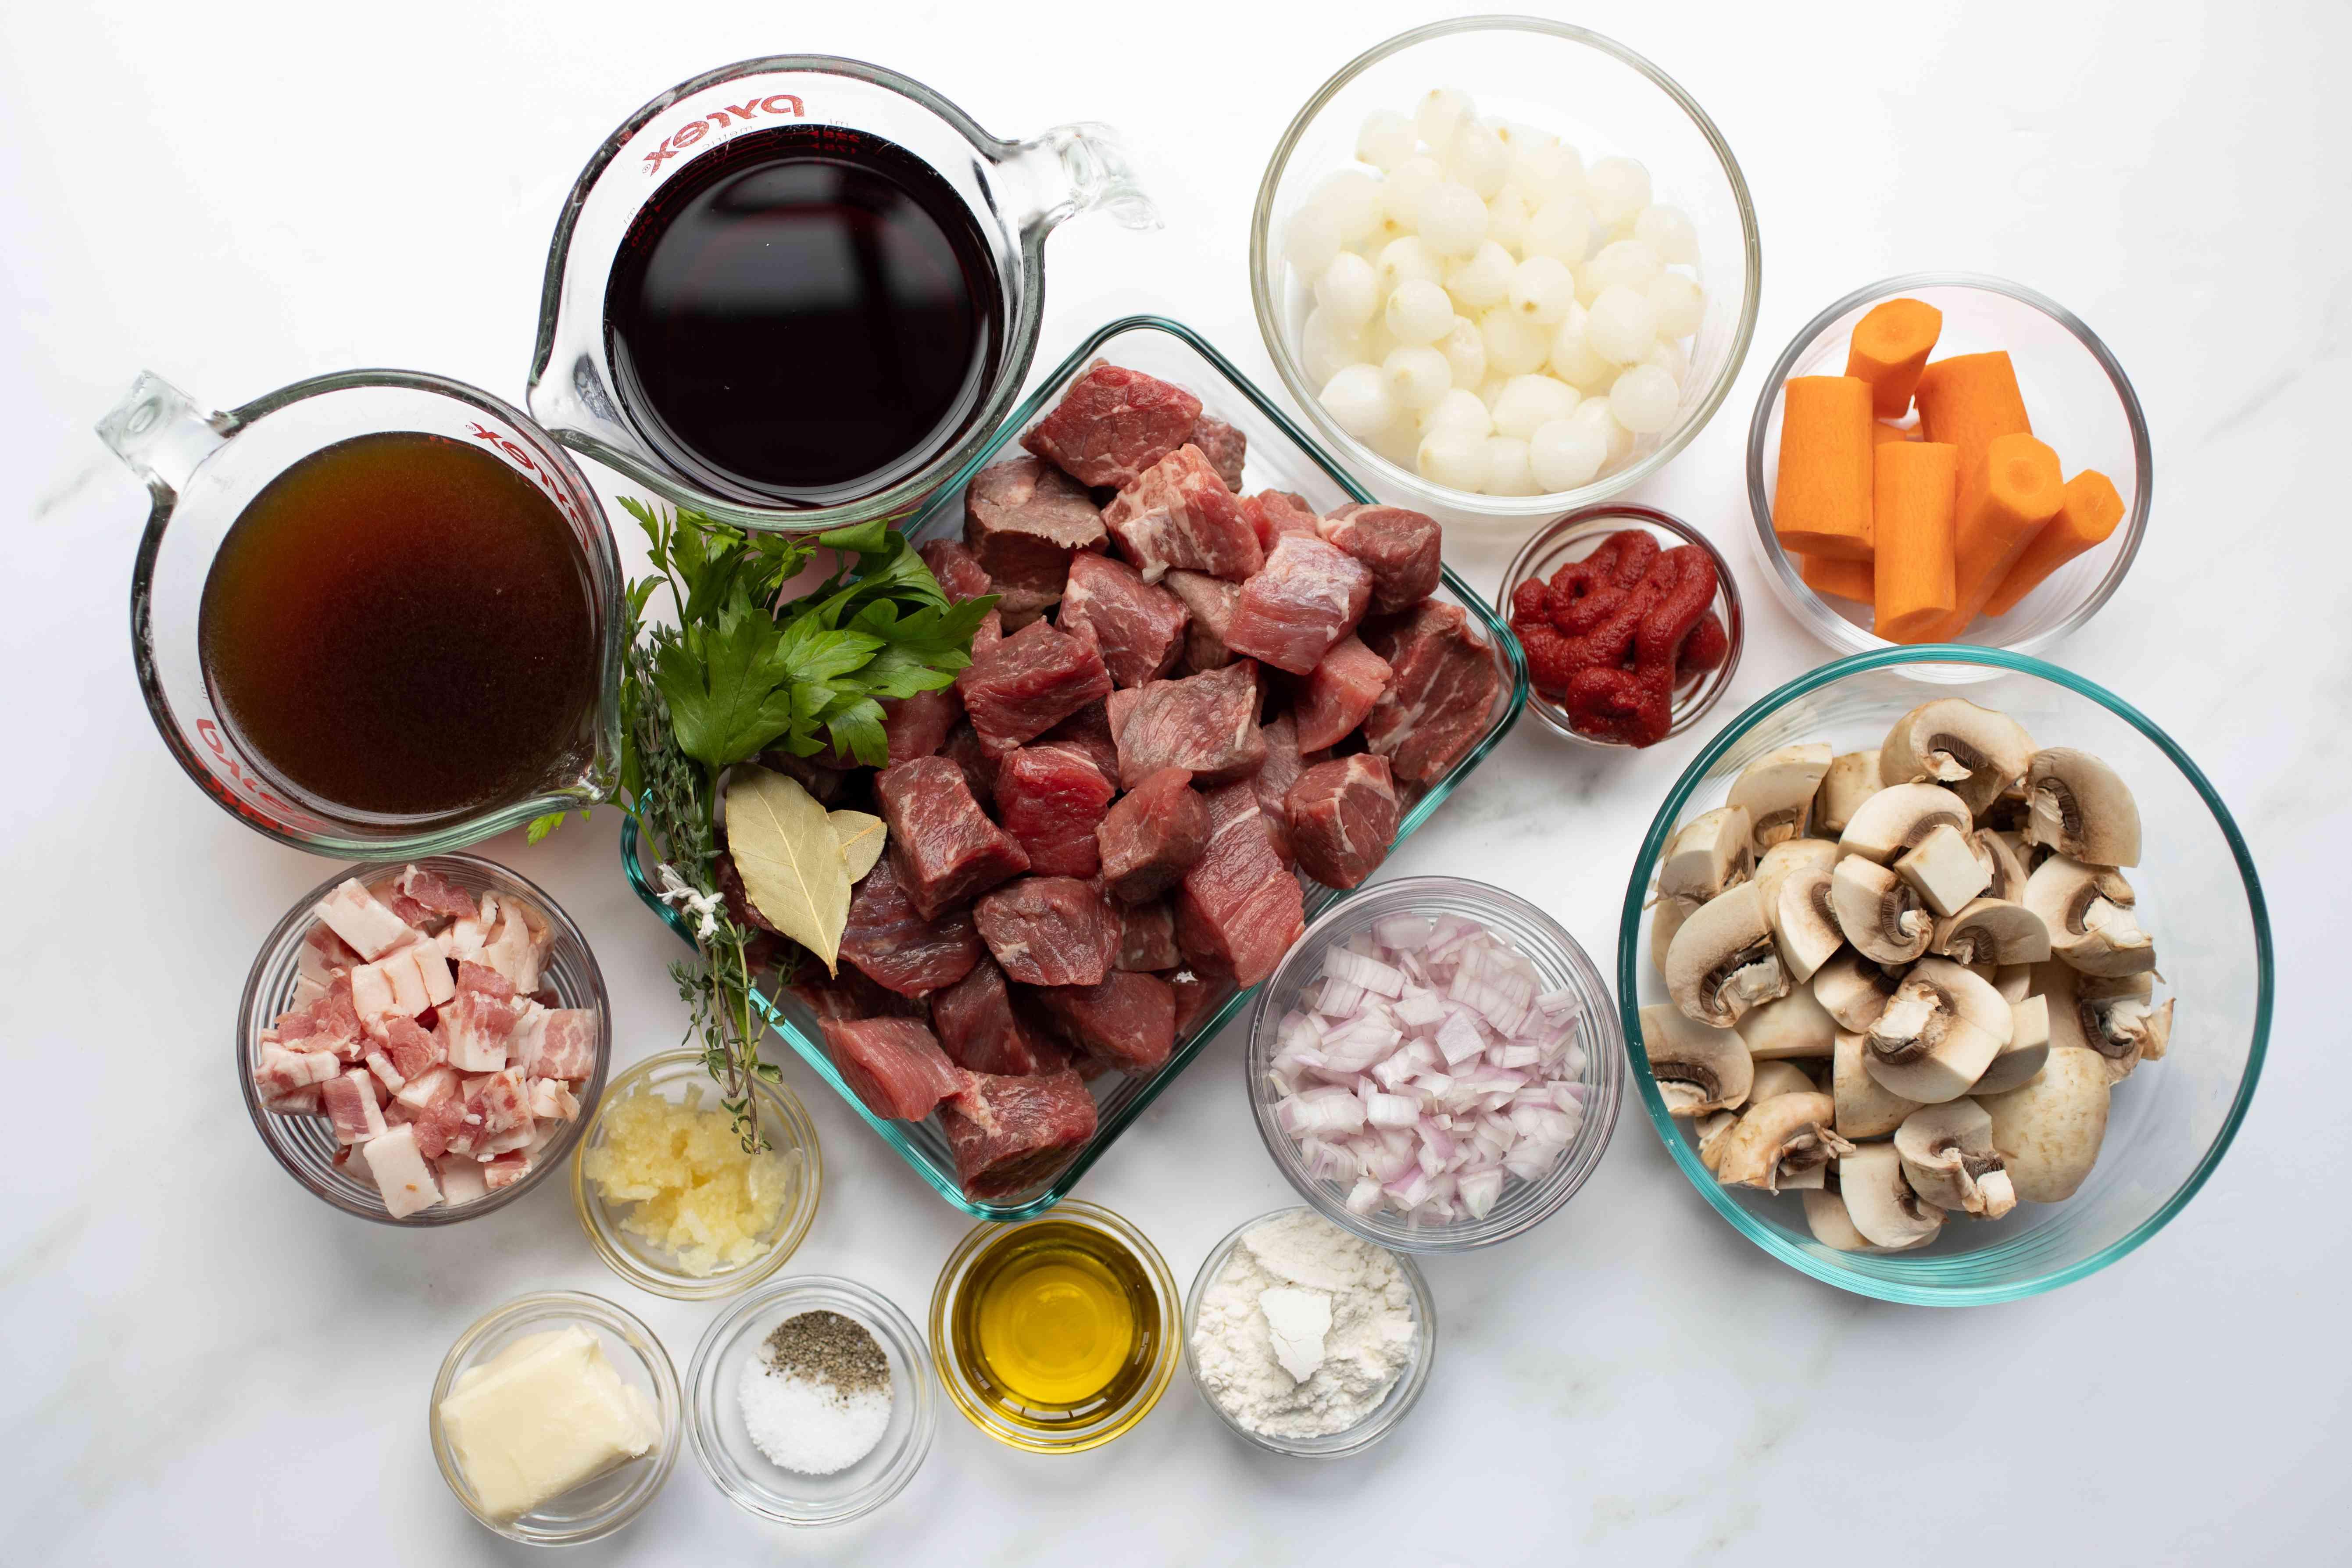 ingredients for instant pot beef bourguignon